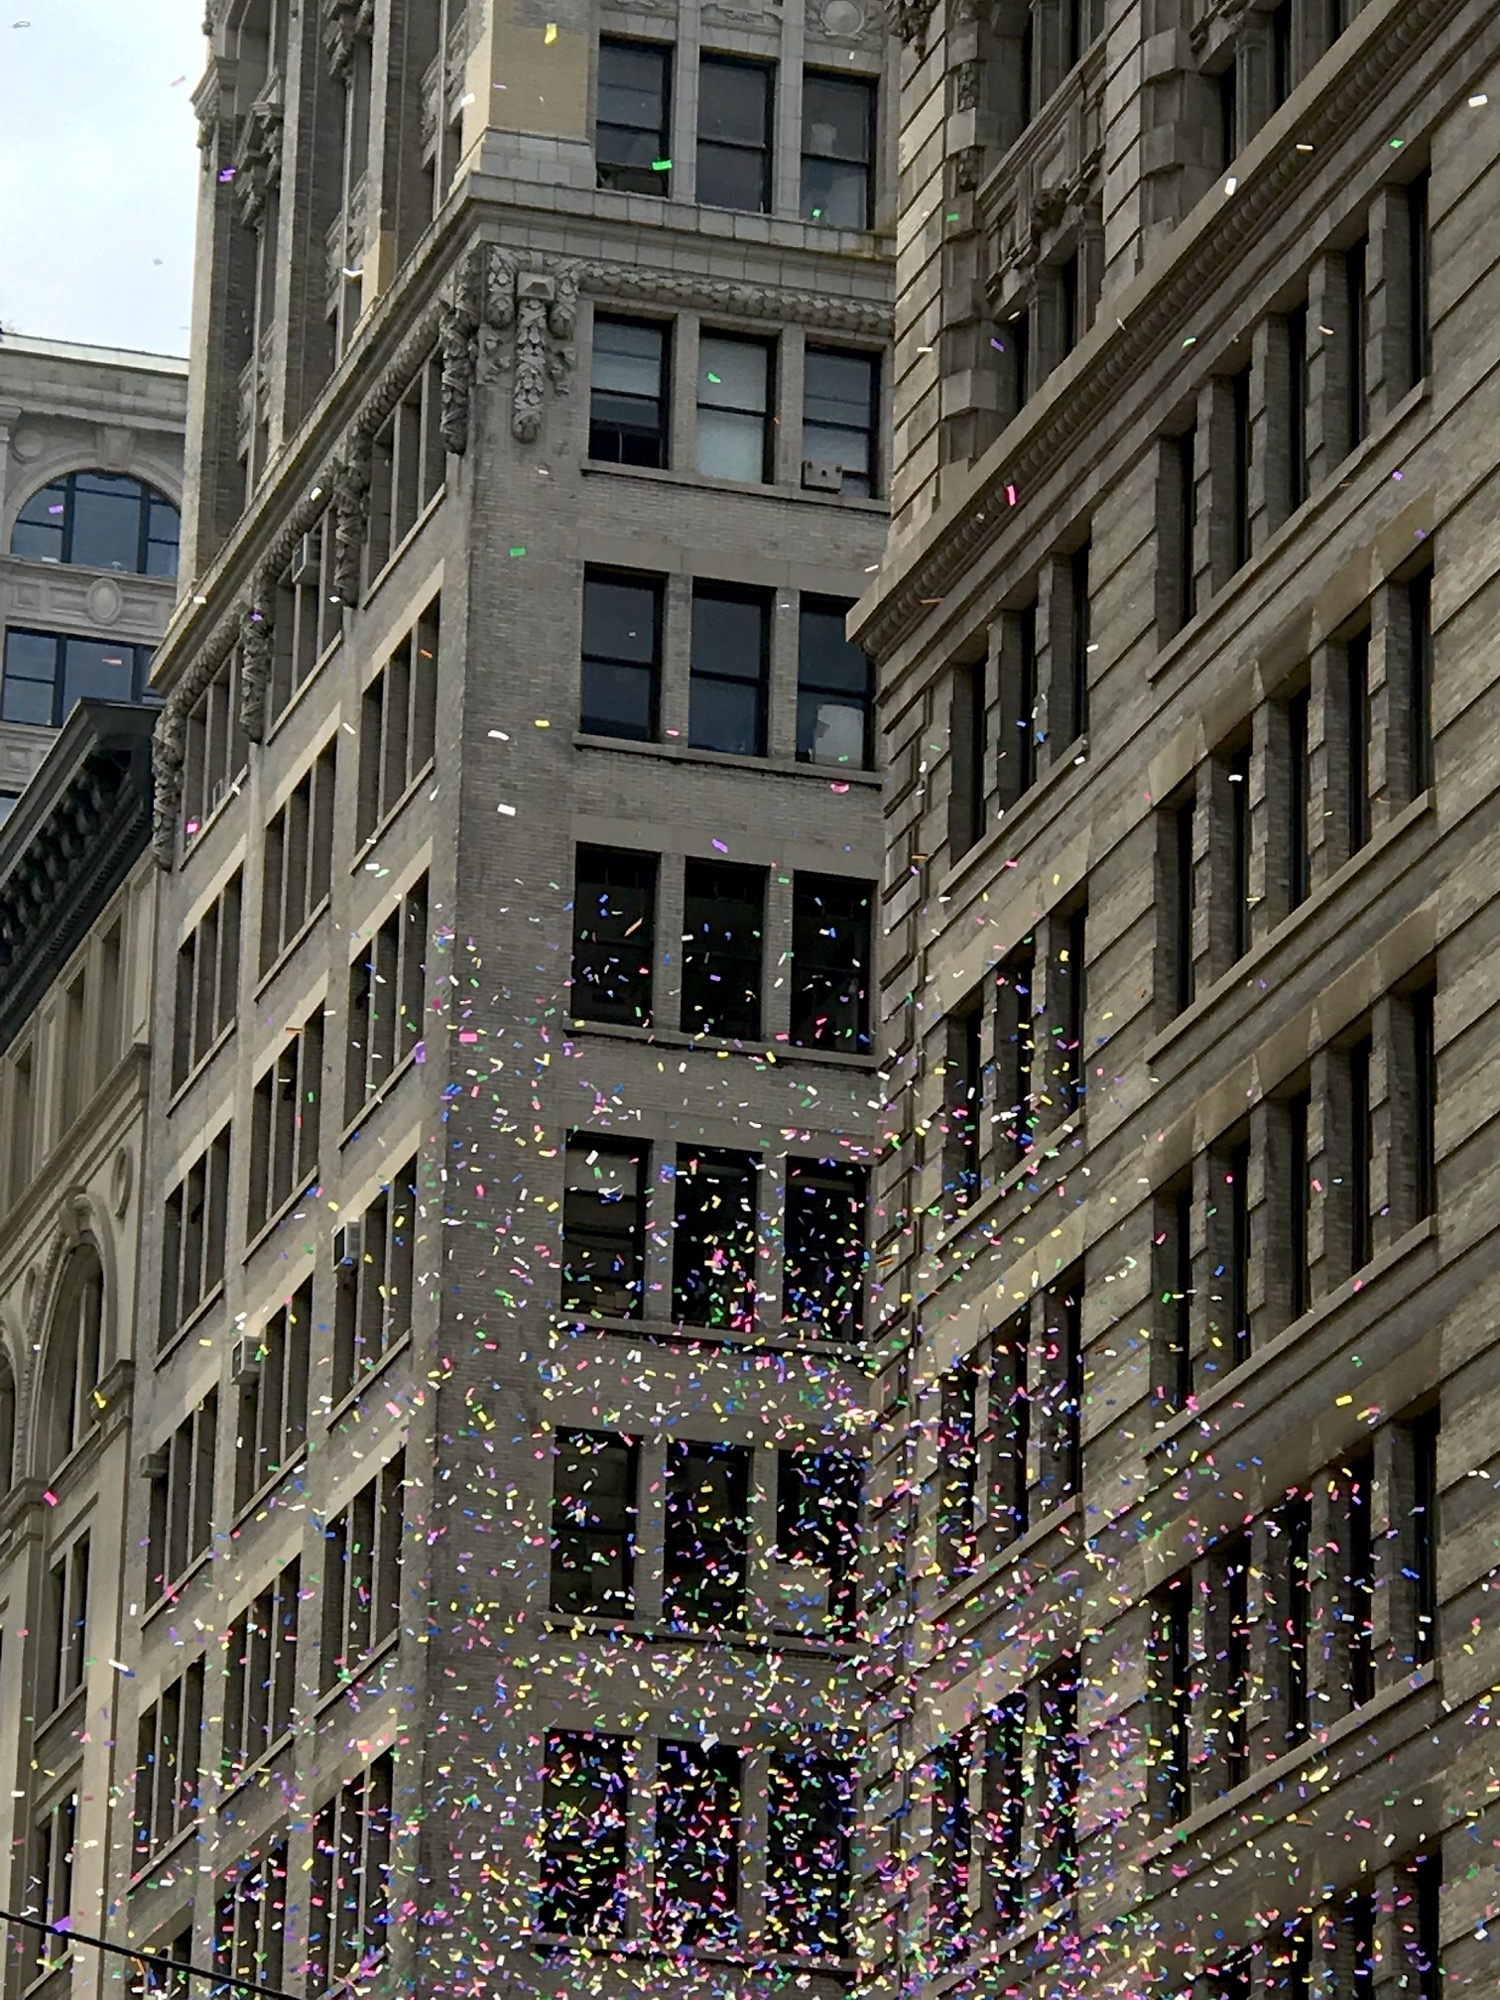 Photo of rainbow confetti against Fifth Avenue buildings.